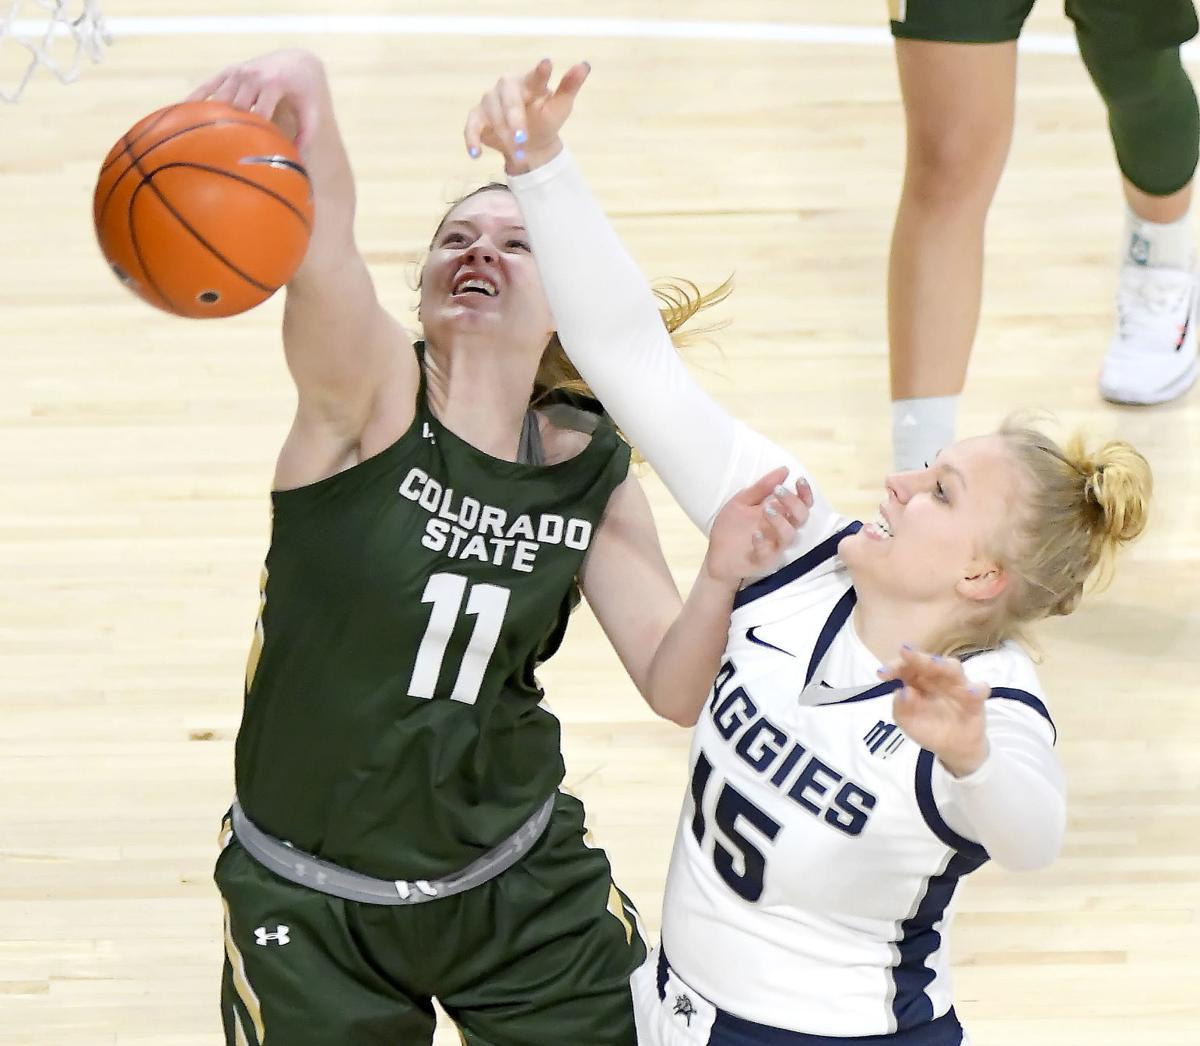 Utah State Colorado State Basketball SECONDARY